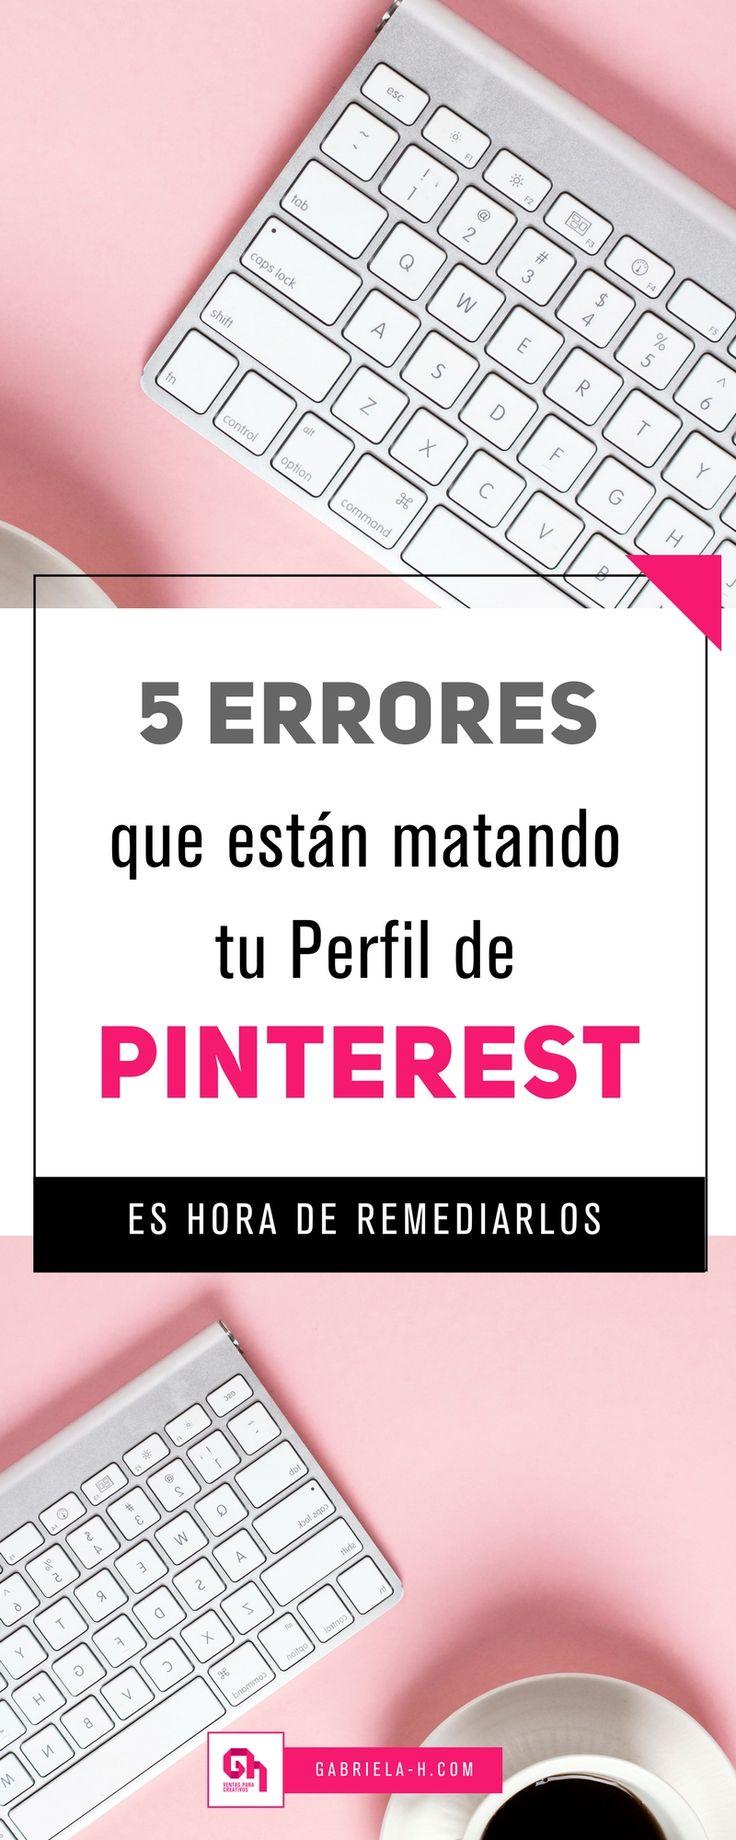 5 Errores que debes evitar al usar Pinterest para tu blog  #pinterestmarketing #pinterestespañol #pinterestespanol #marketingdigital